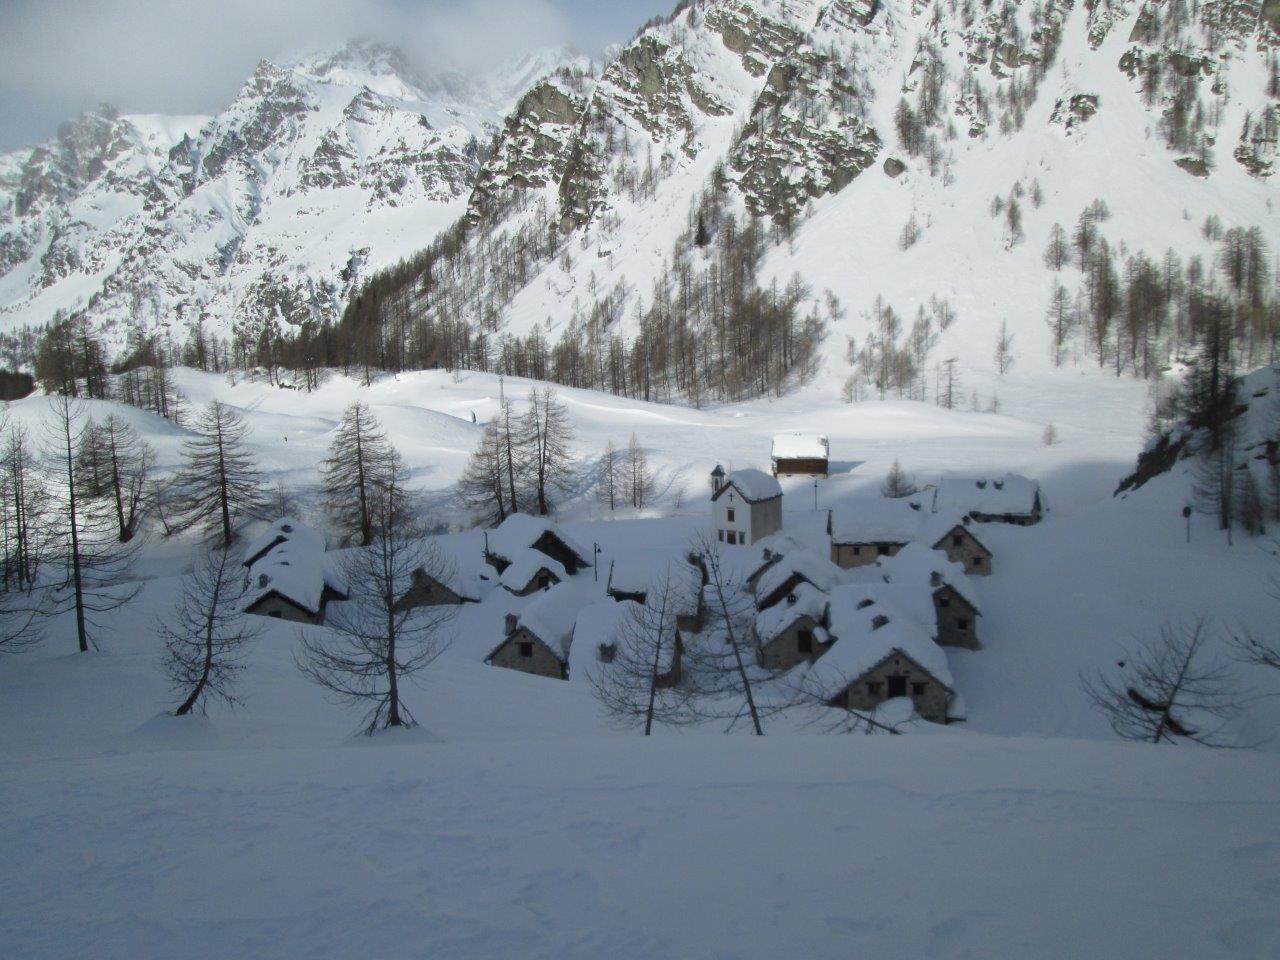 Alpe Crampiolo